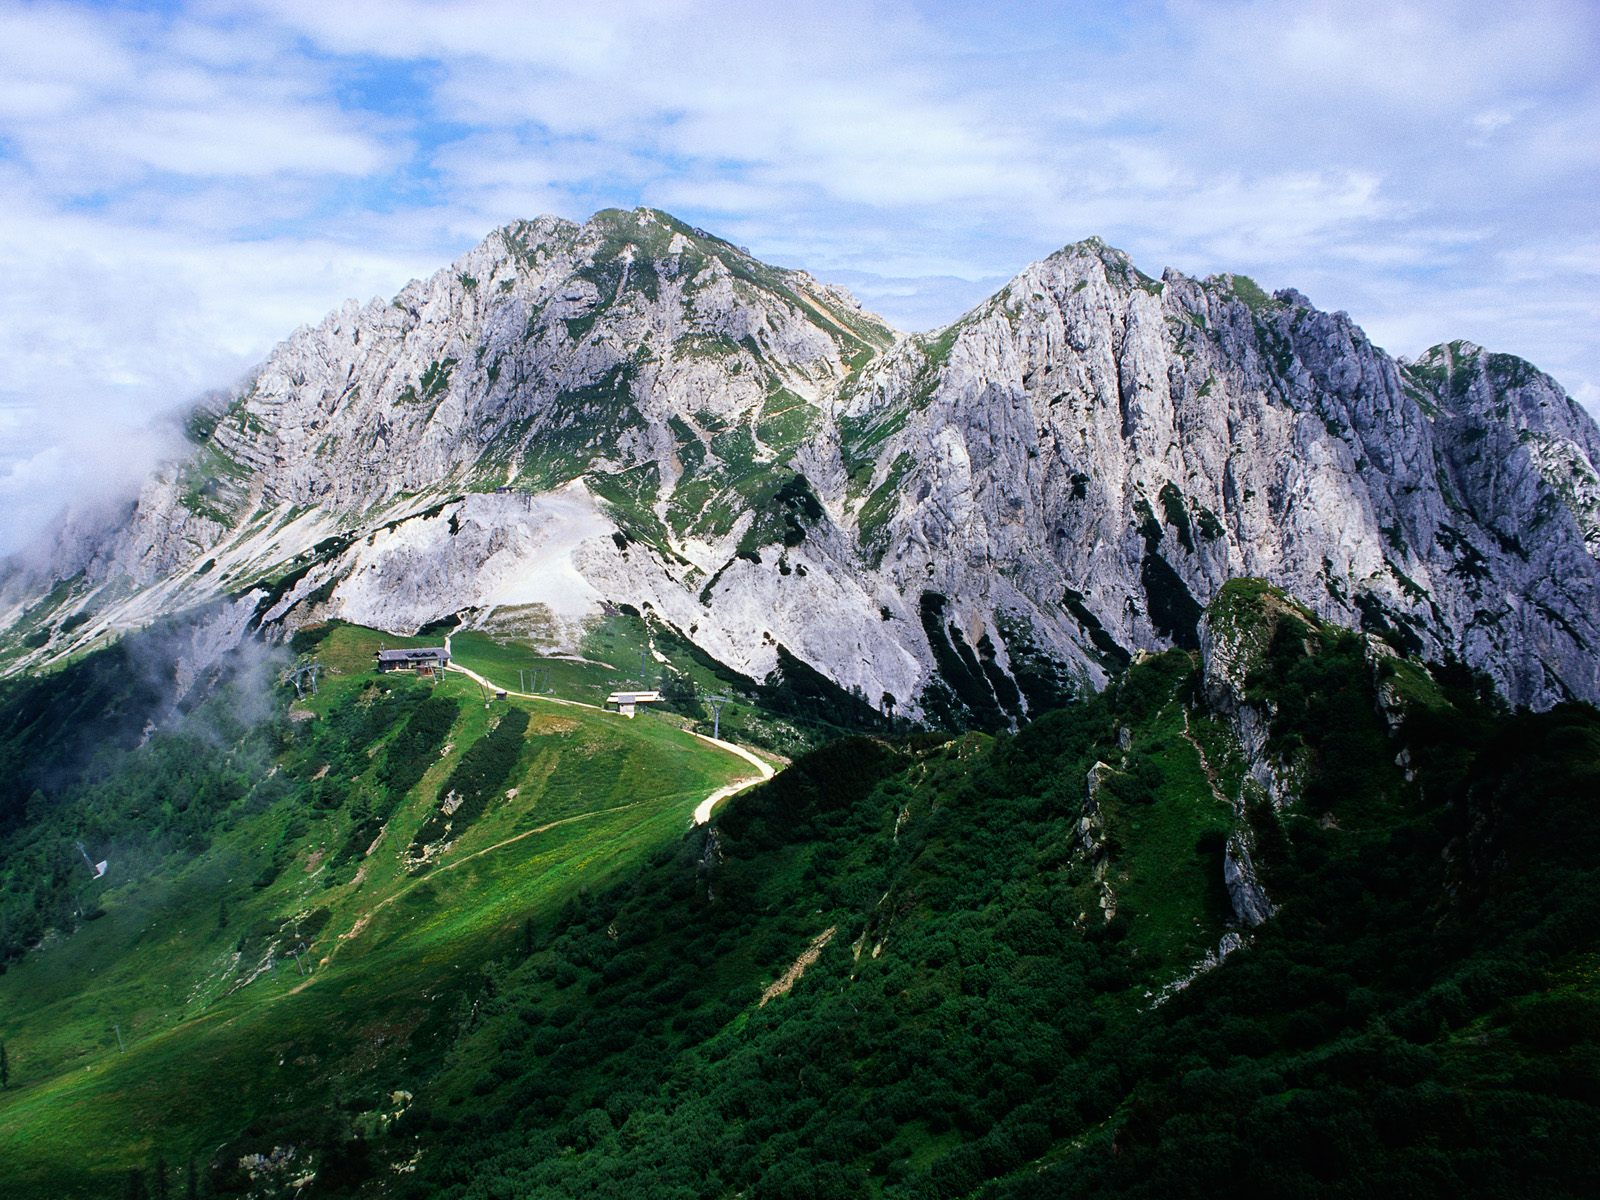 http://3.bp.blogspot.com/-7nPojzIegZE/Tcp236QdctI/AAAAAAAACWg/rx9PFmRmWBE/s1600/Carnic+Alps%252C+Friuli-Venezia+Giulia+Region%252C+Italy.jpg